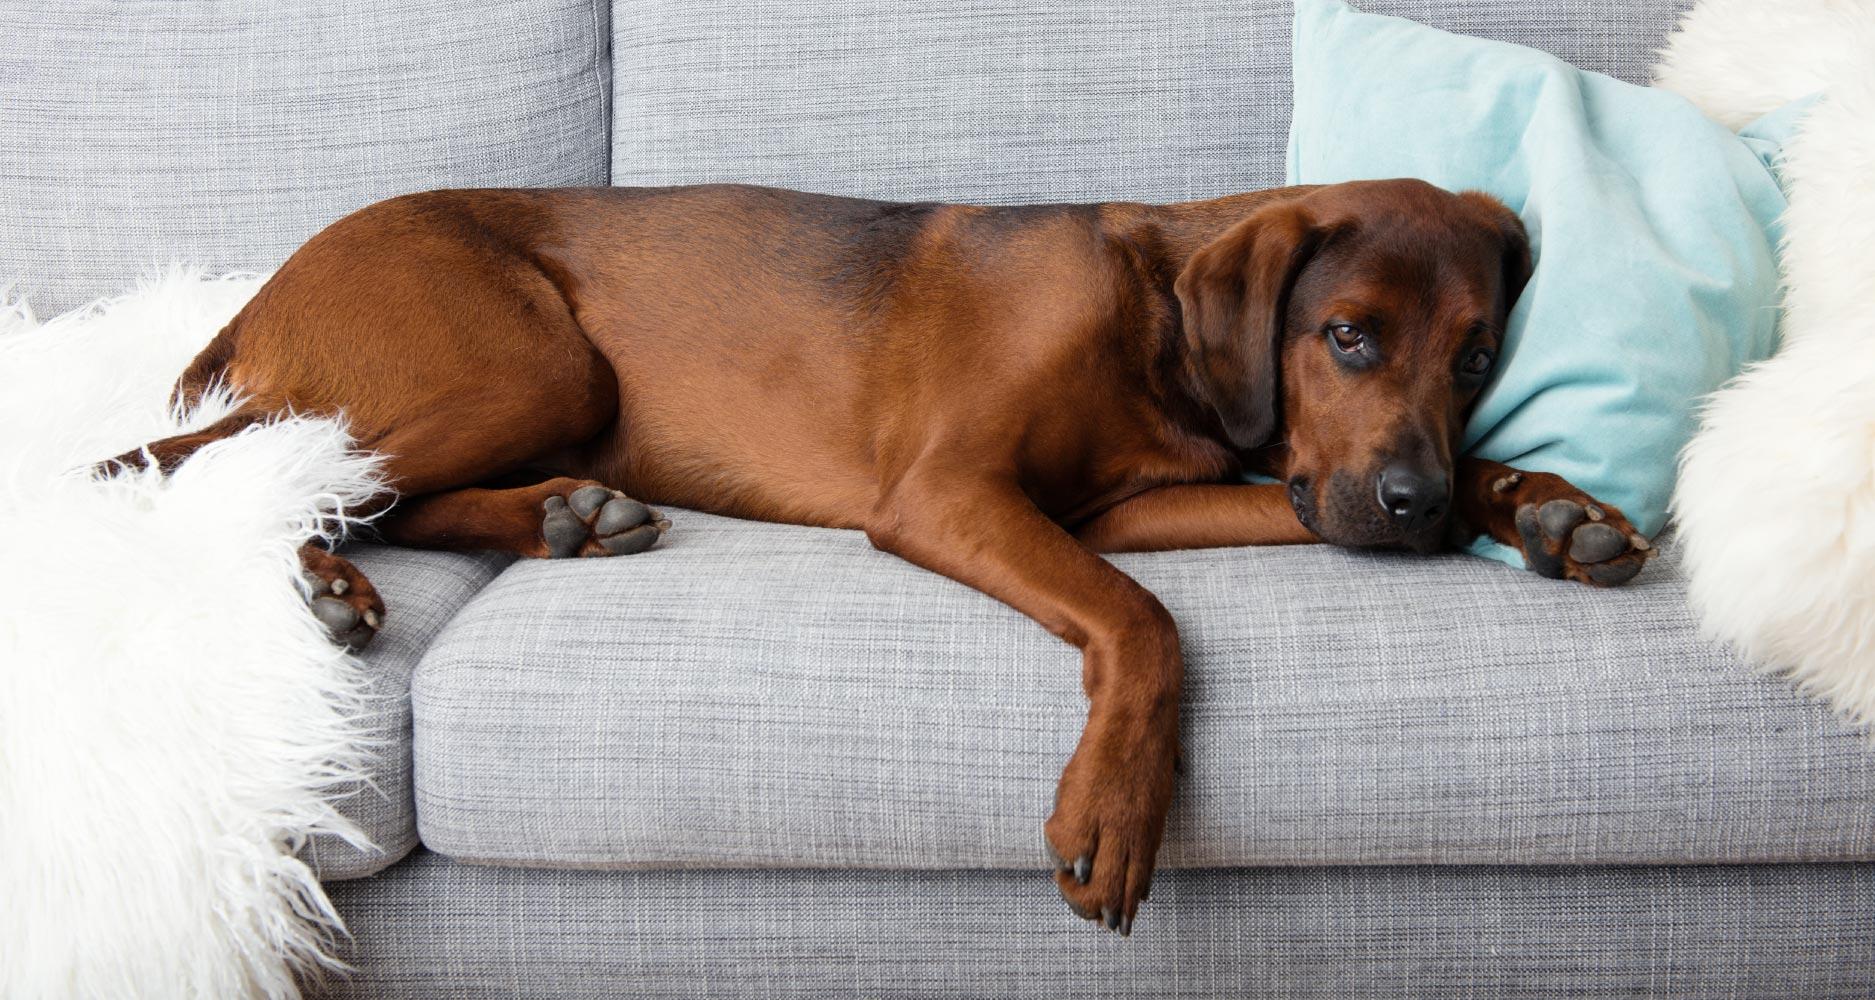 image of dog with seizure